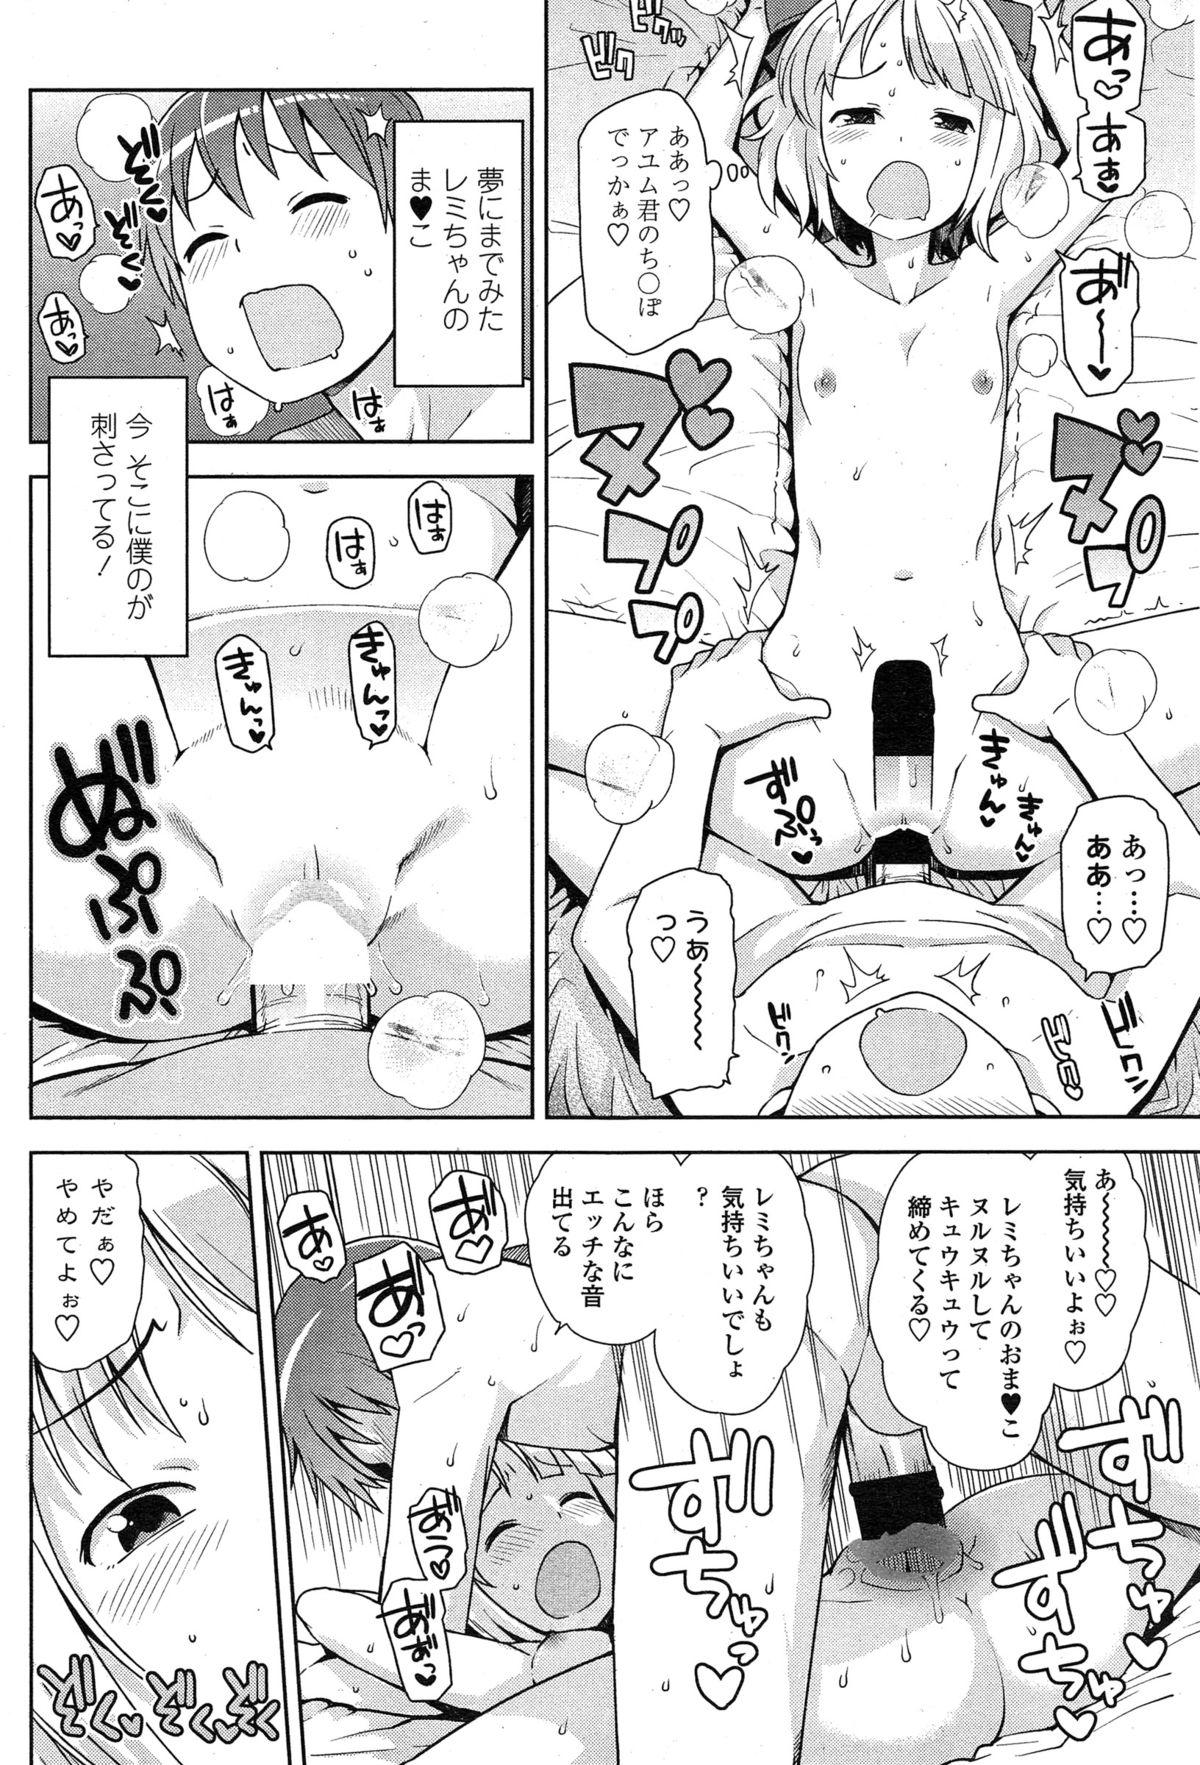 COMIC Penguin Club Sanzokuban 2014-12 71